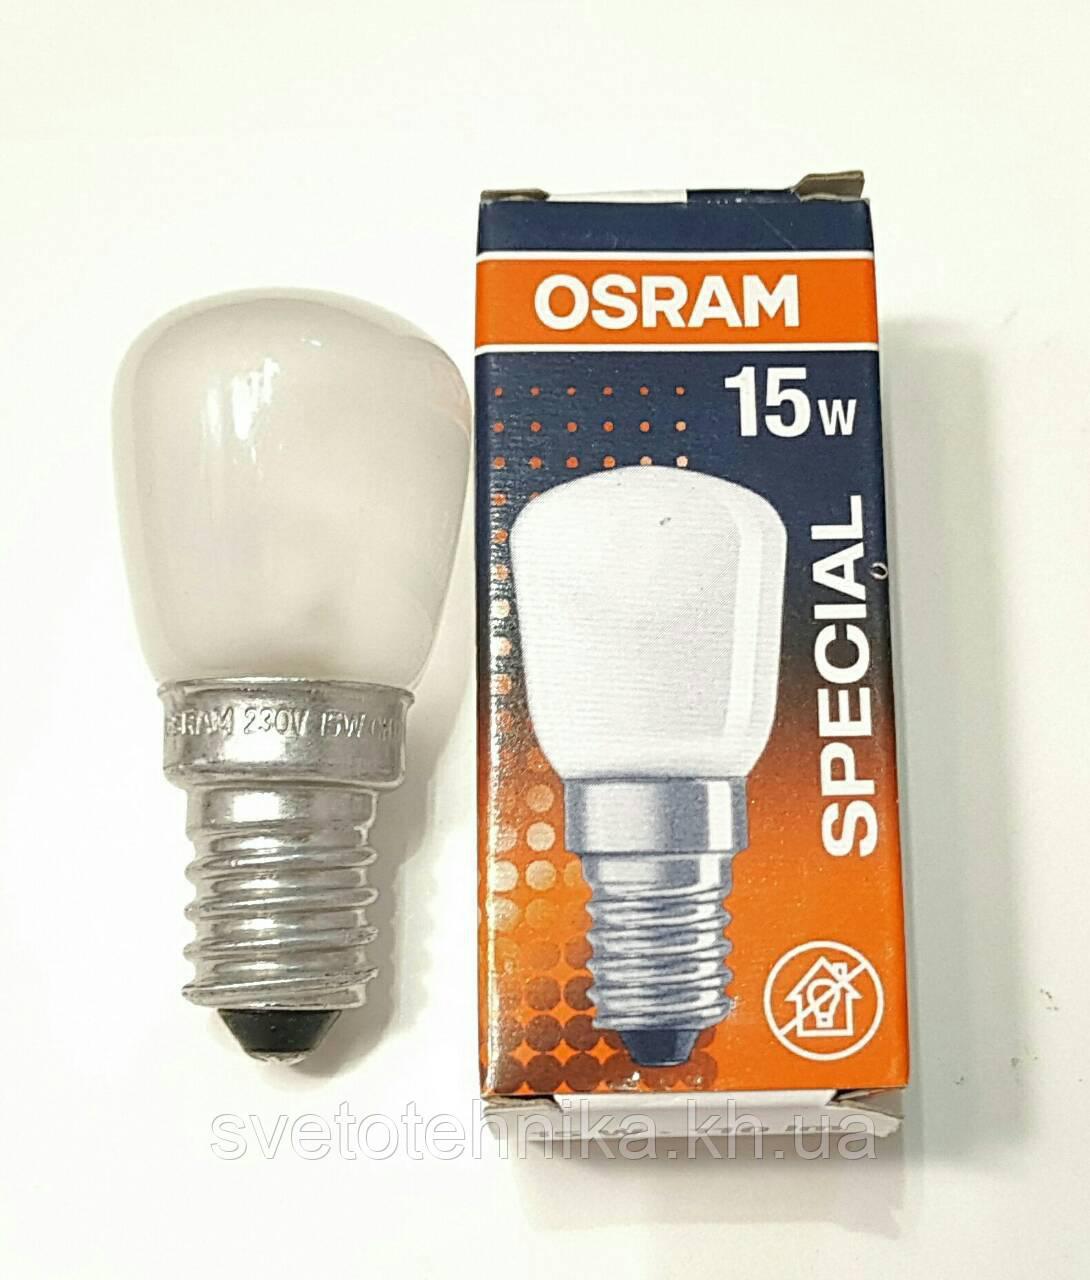 Лампа Osram special 15w E14 для холодильника